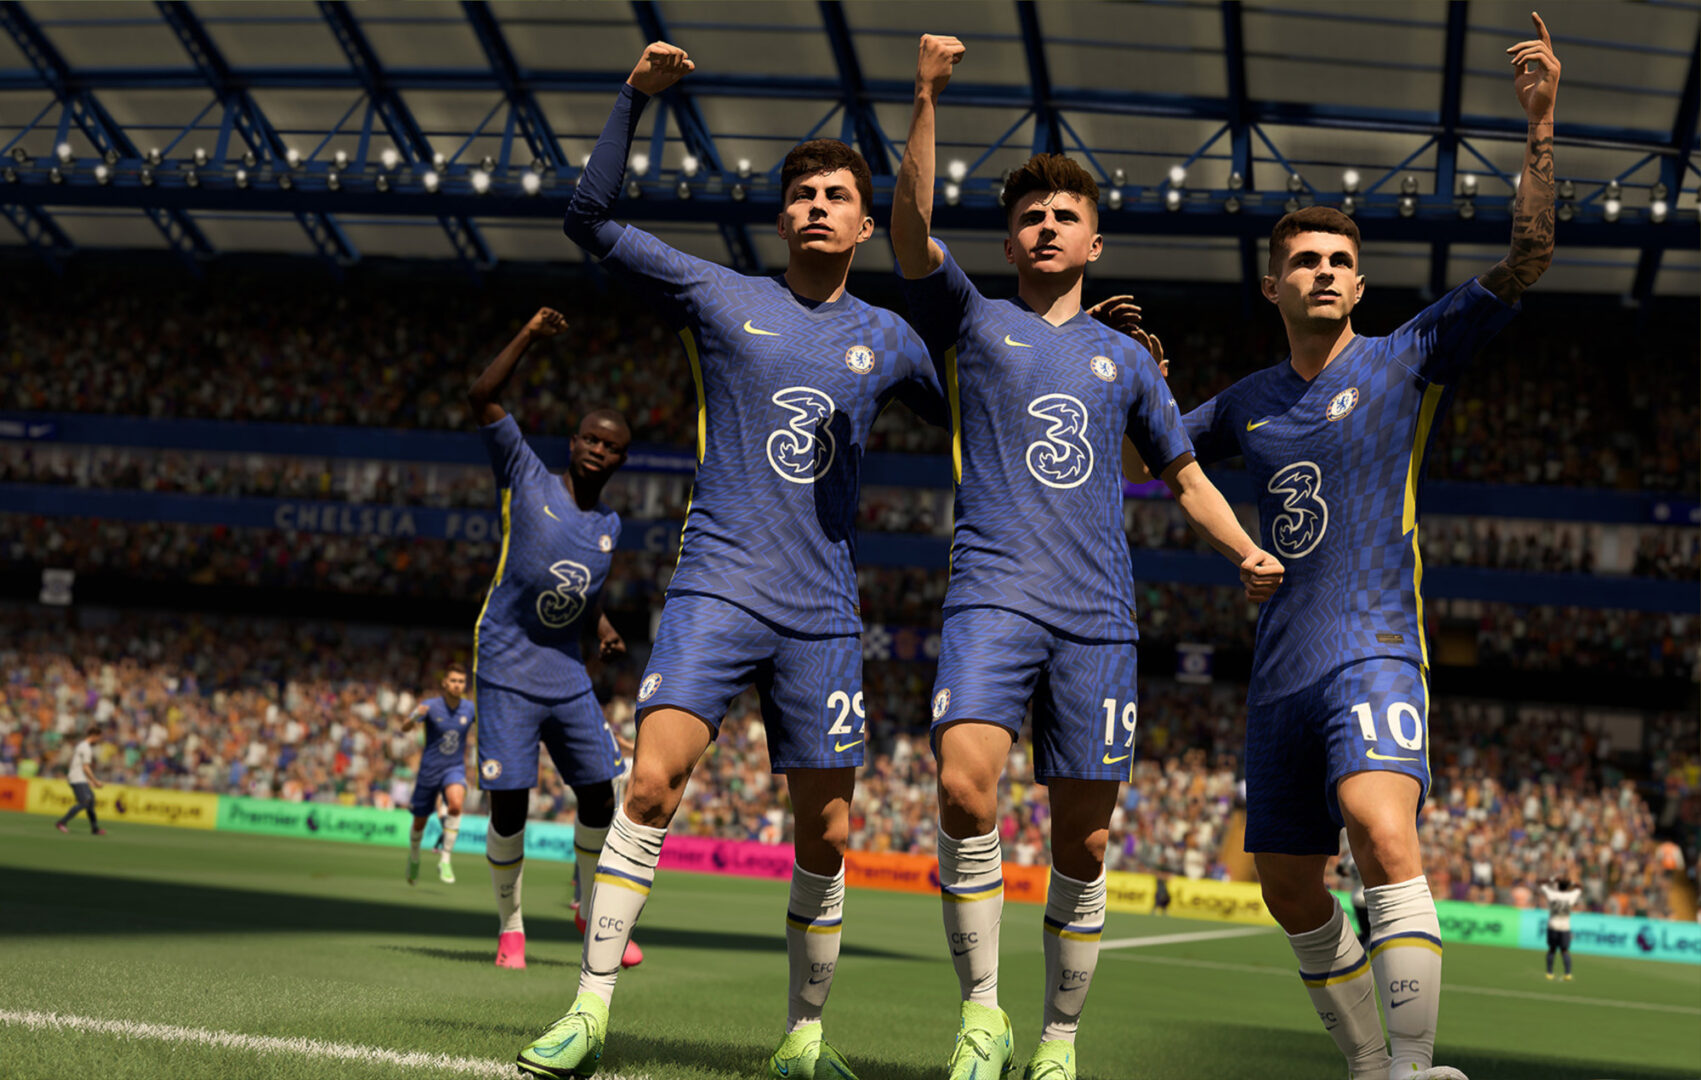 FIFA 22 bicycle kicks